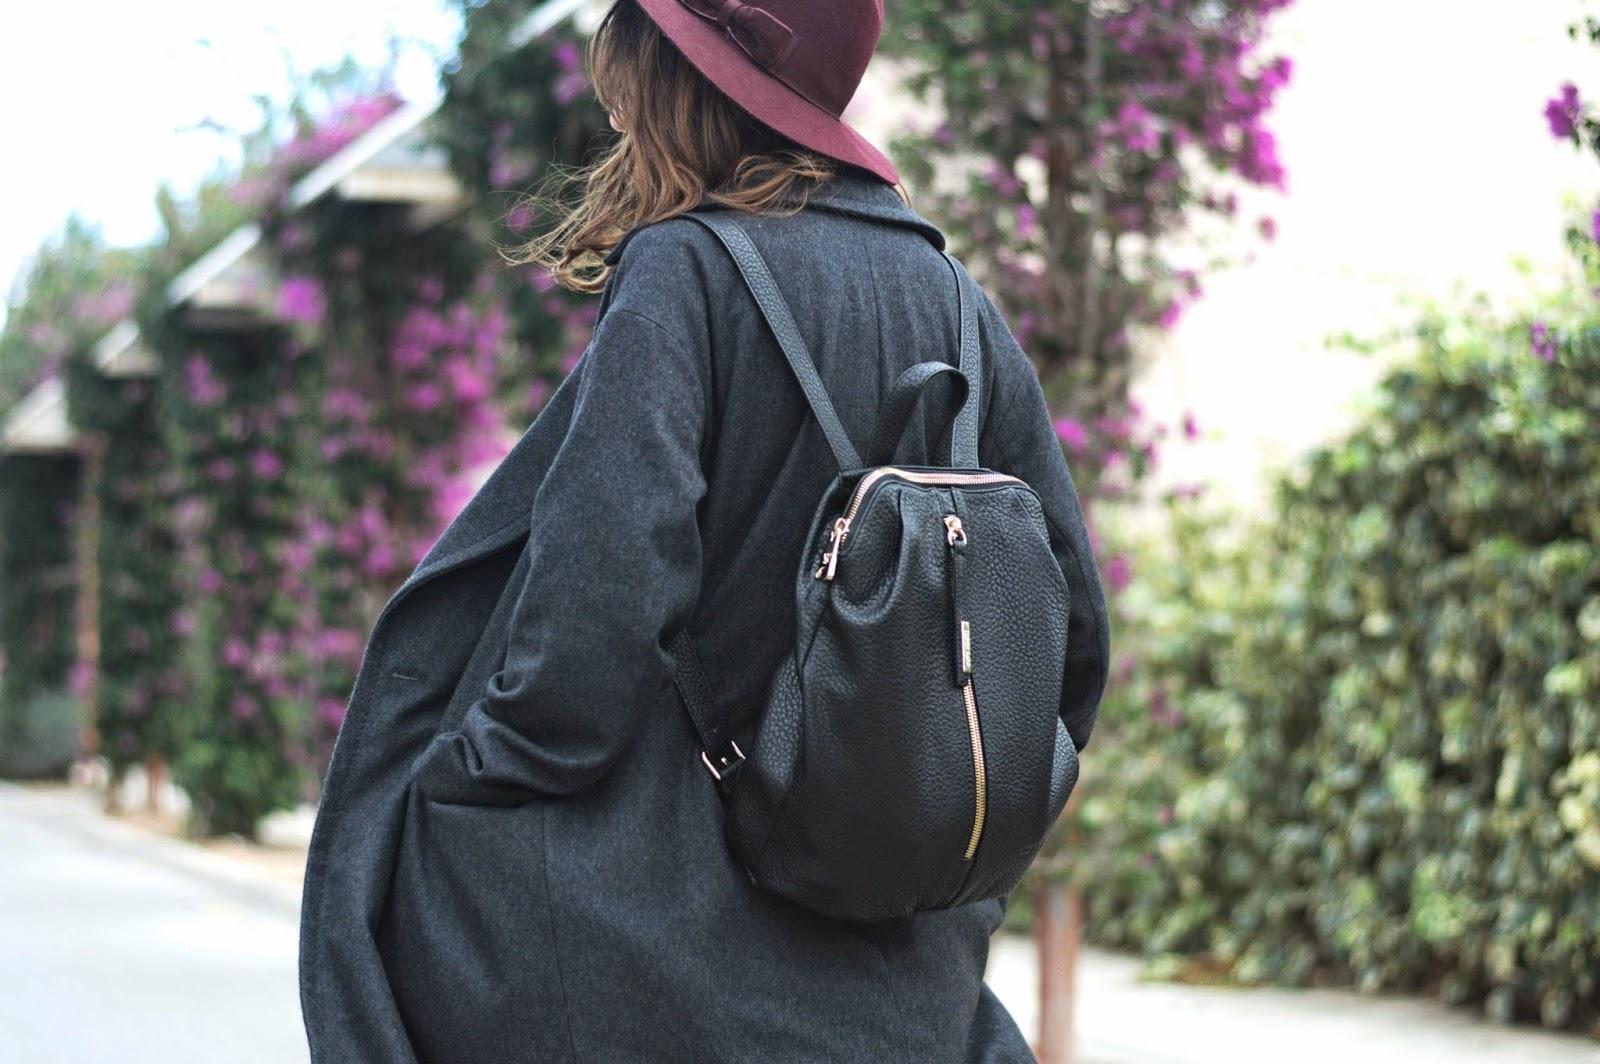 bolso Pepe Moll, abrigo H&M, falda vintage, blusa vintage, botines Zara